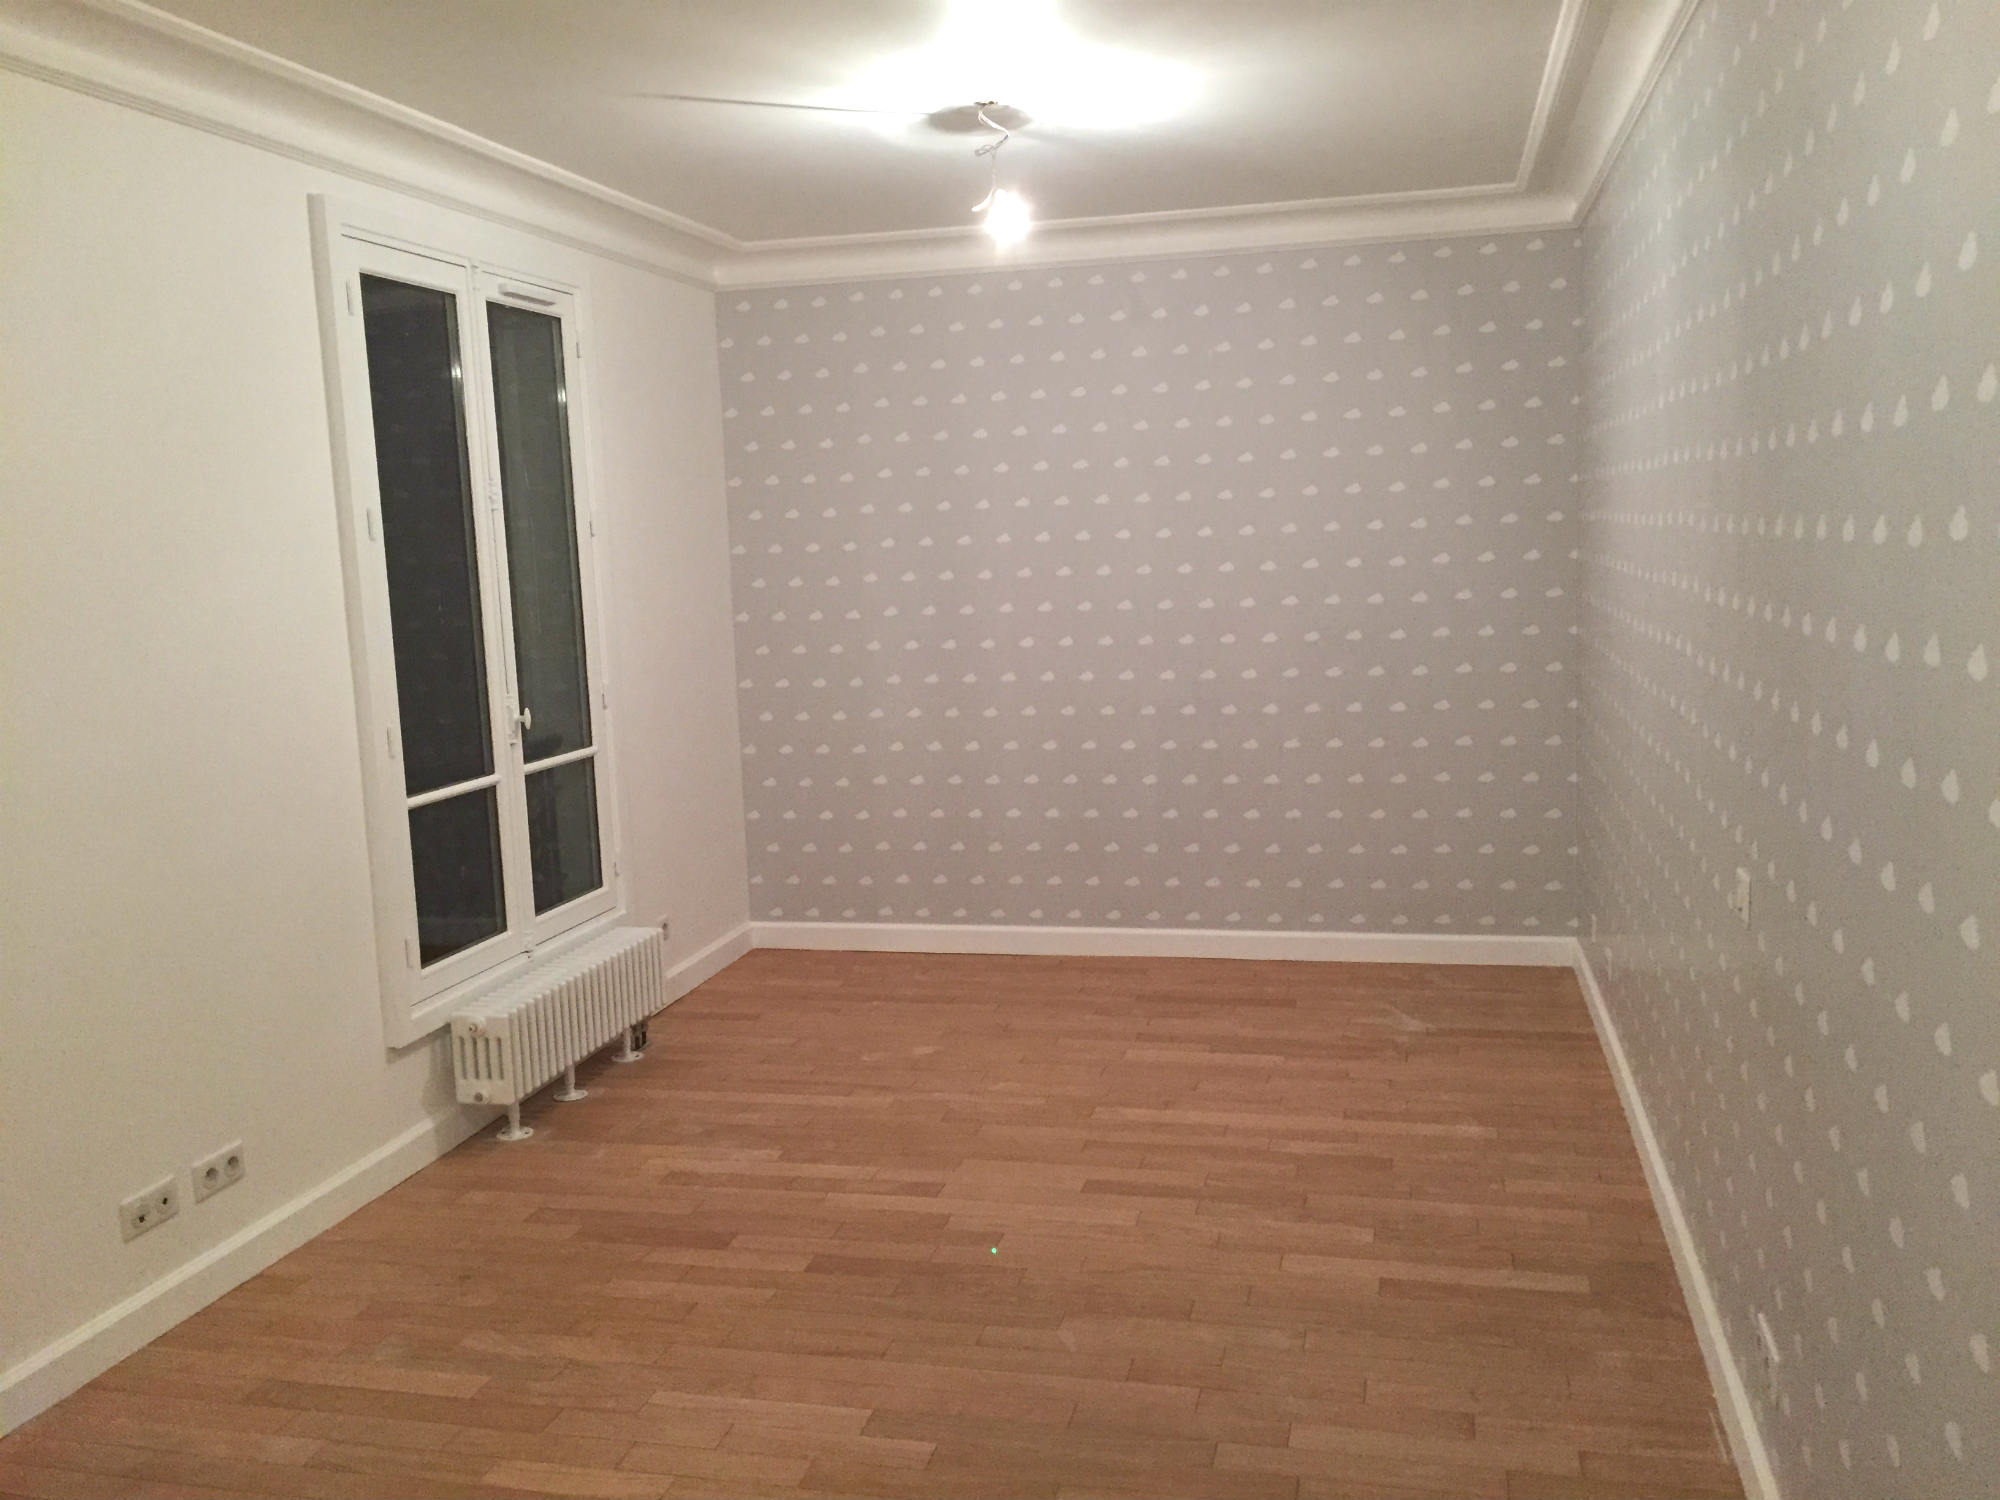 2016 travaux renovation appartement transformation F2 en F3 Paris rue Damremont_Eolh btp france 8